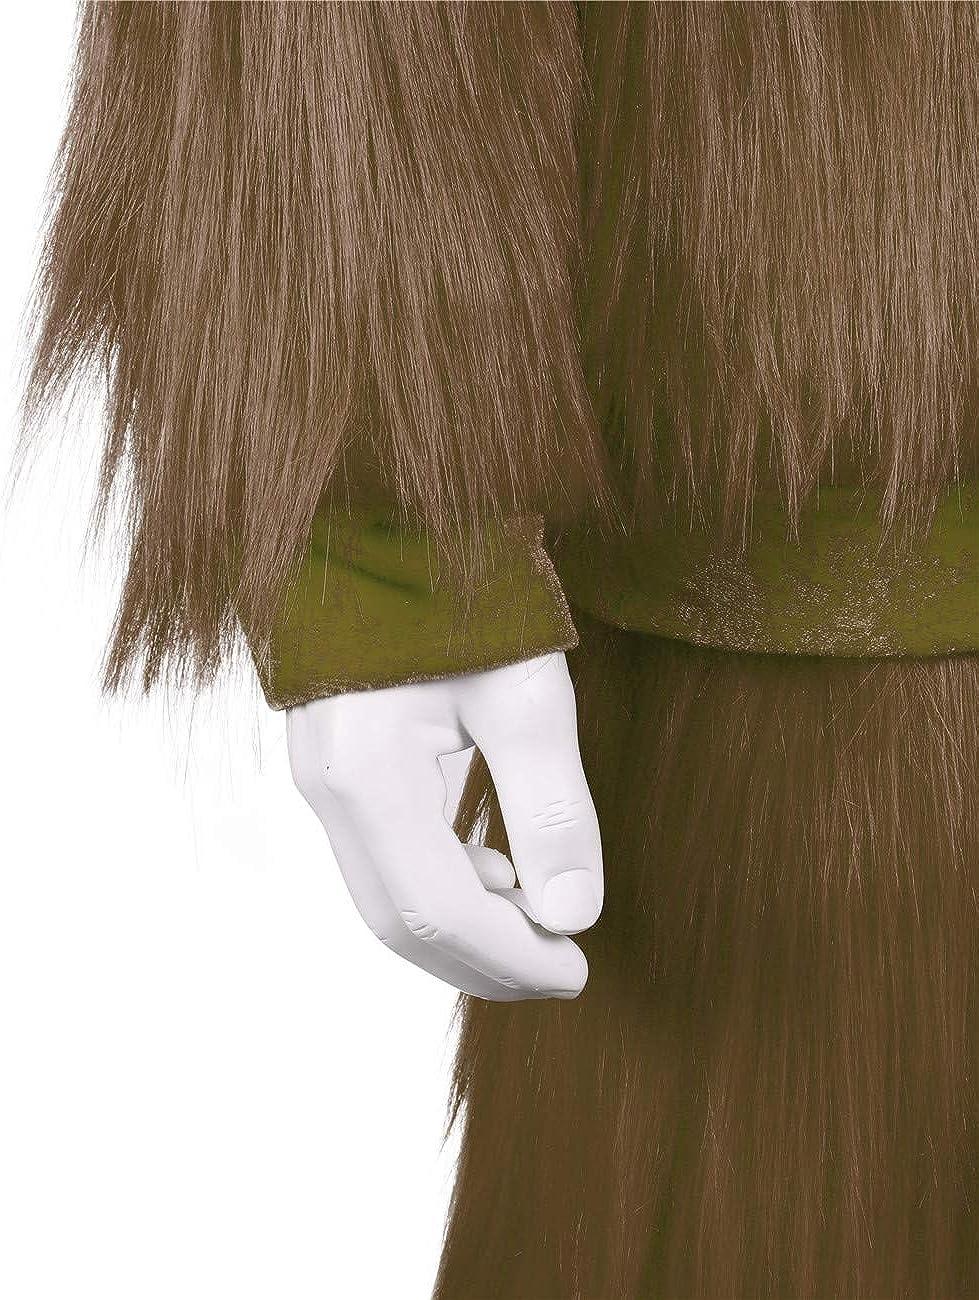 PONGONE Green Pants Green Bottoms with Fur Long Trousers Warm Fuzzy Pajama Sleep Pants